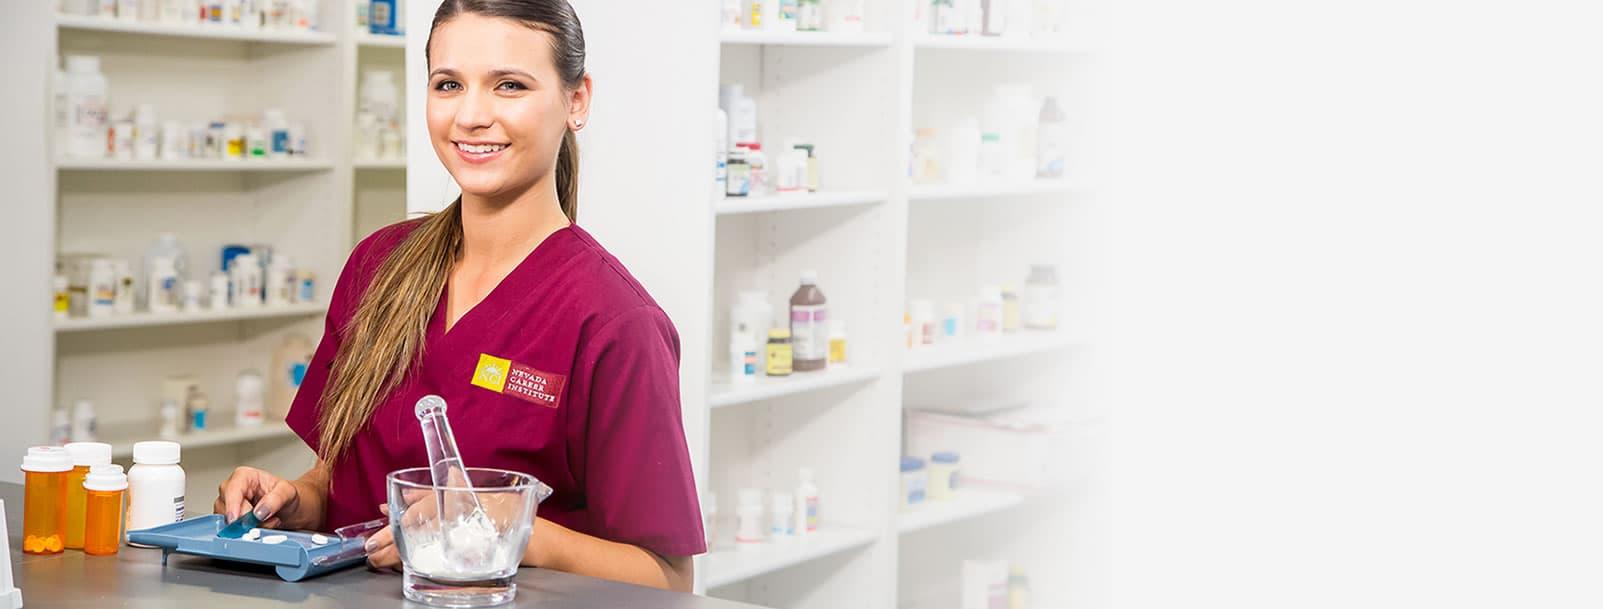 Nevada Career Institute's Pharmacy Technician Program Earns ASHP/ACPE Accreditation